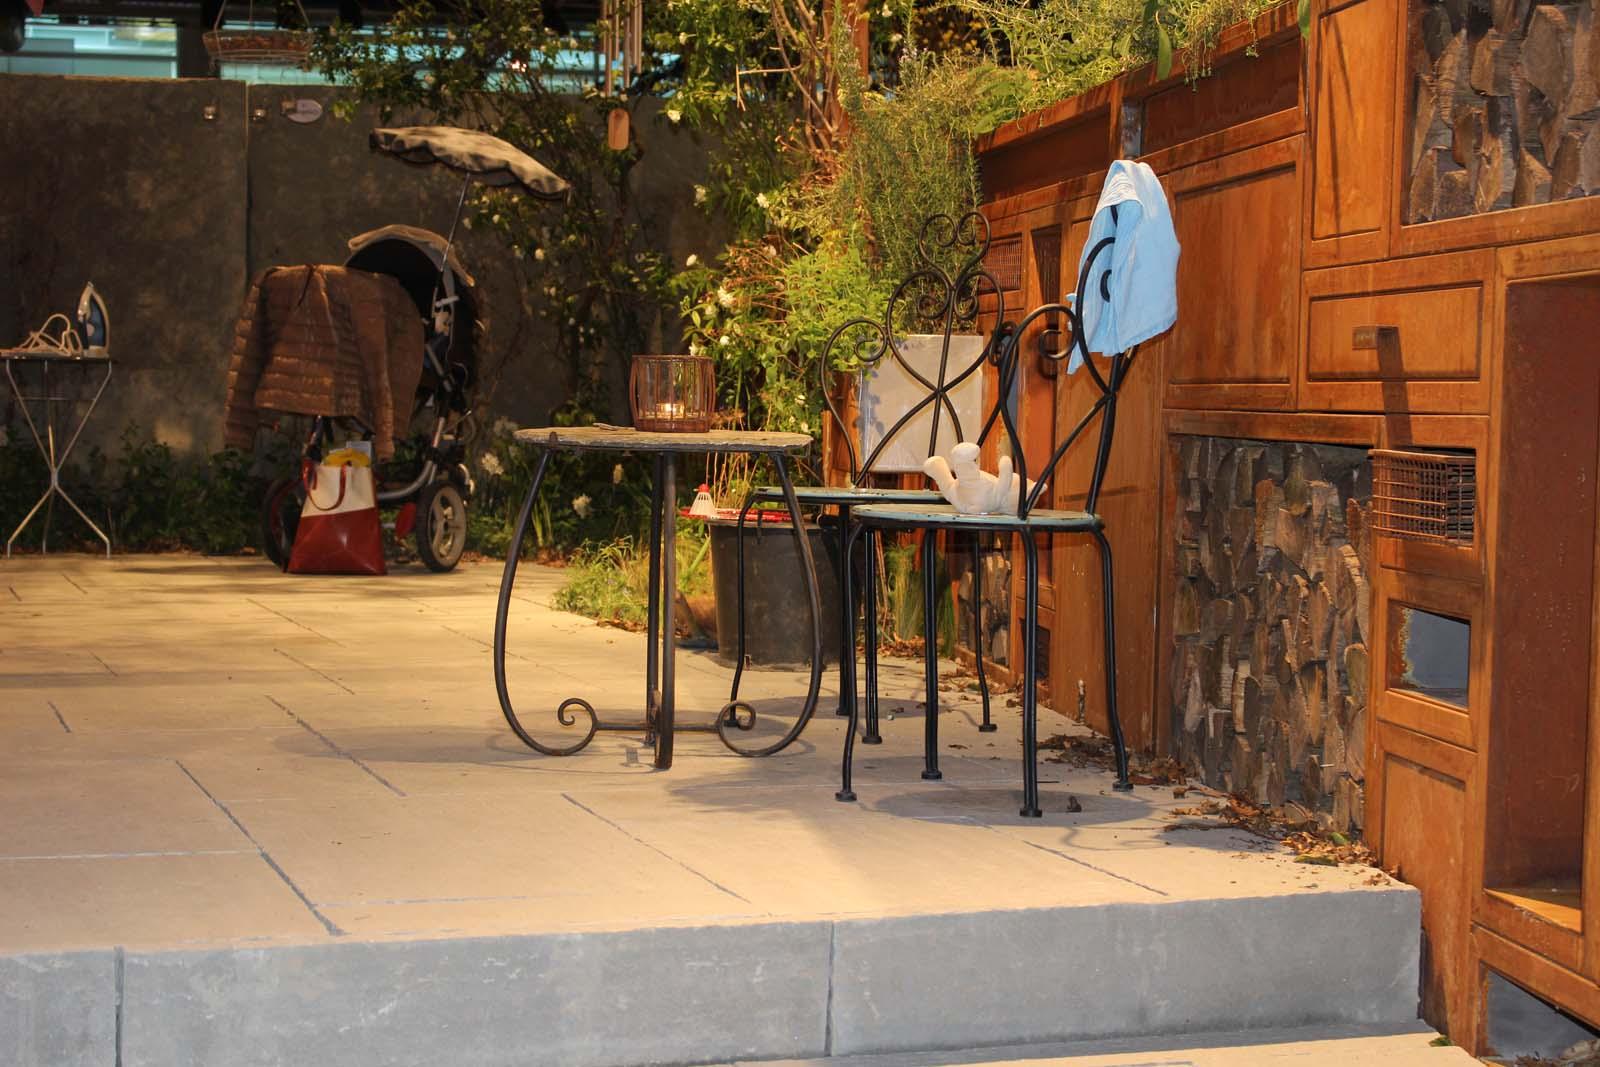 news bachofer ag metallbau treppen gel nder haus und gartengestaltung. Black Bedroom Furniture Sets. Home Design Ideas